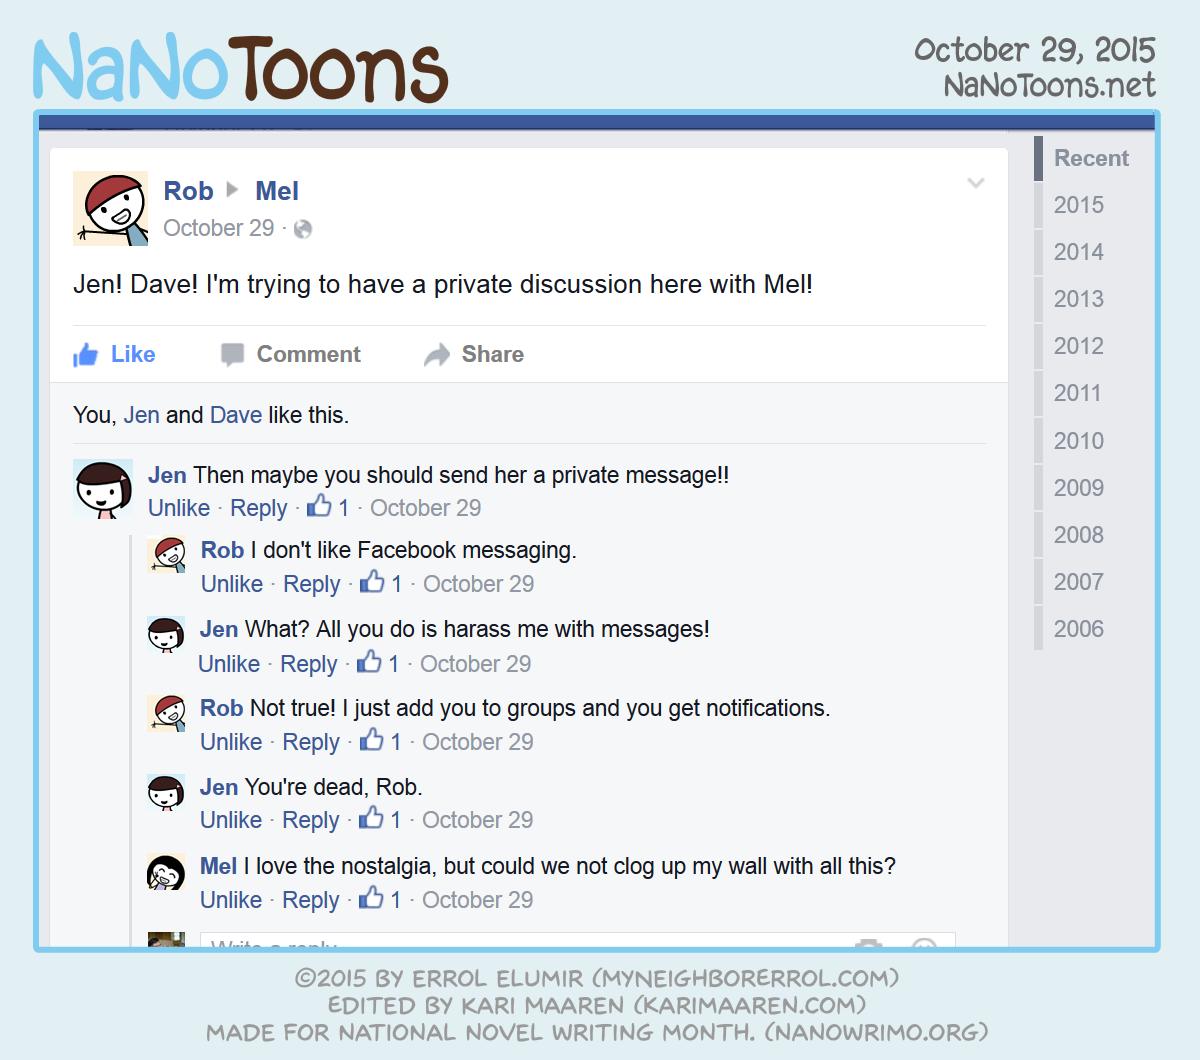 NaNoToons_2015_10_29